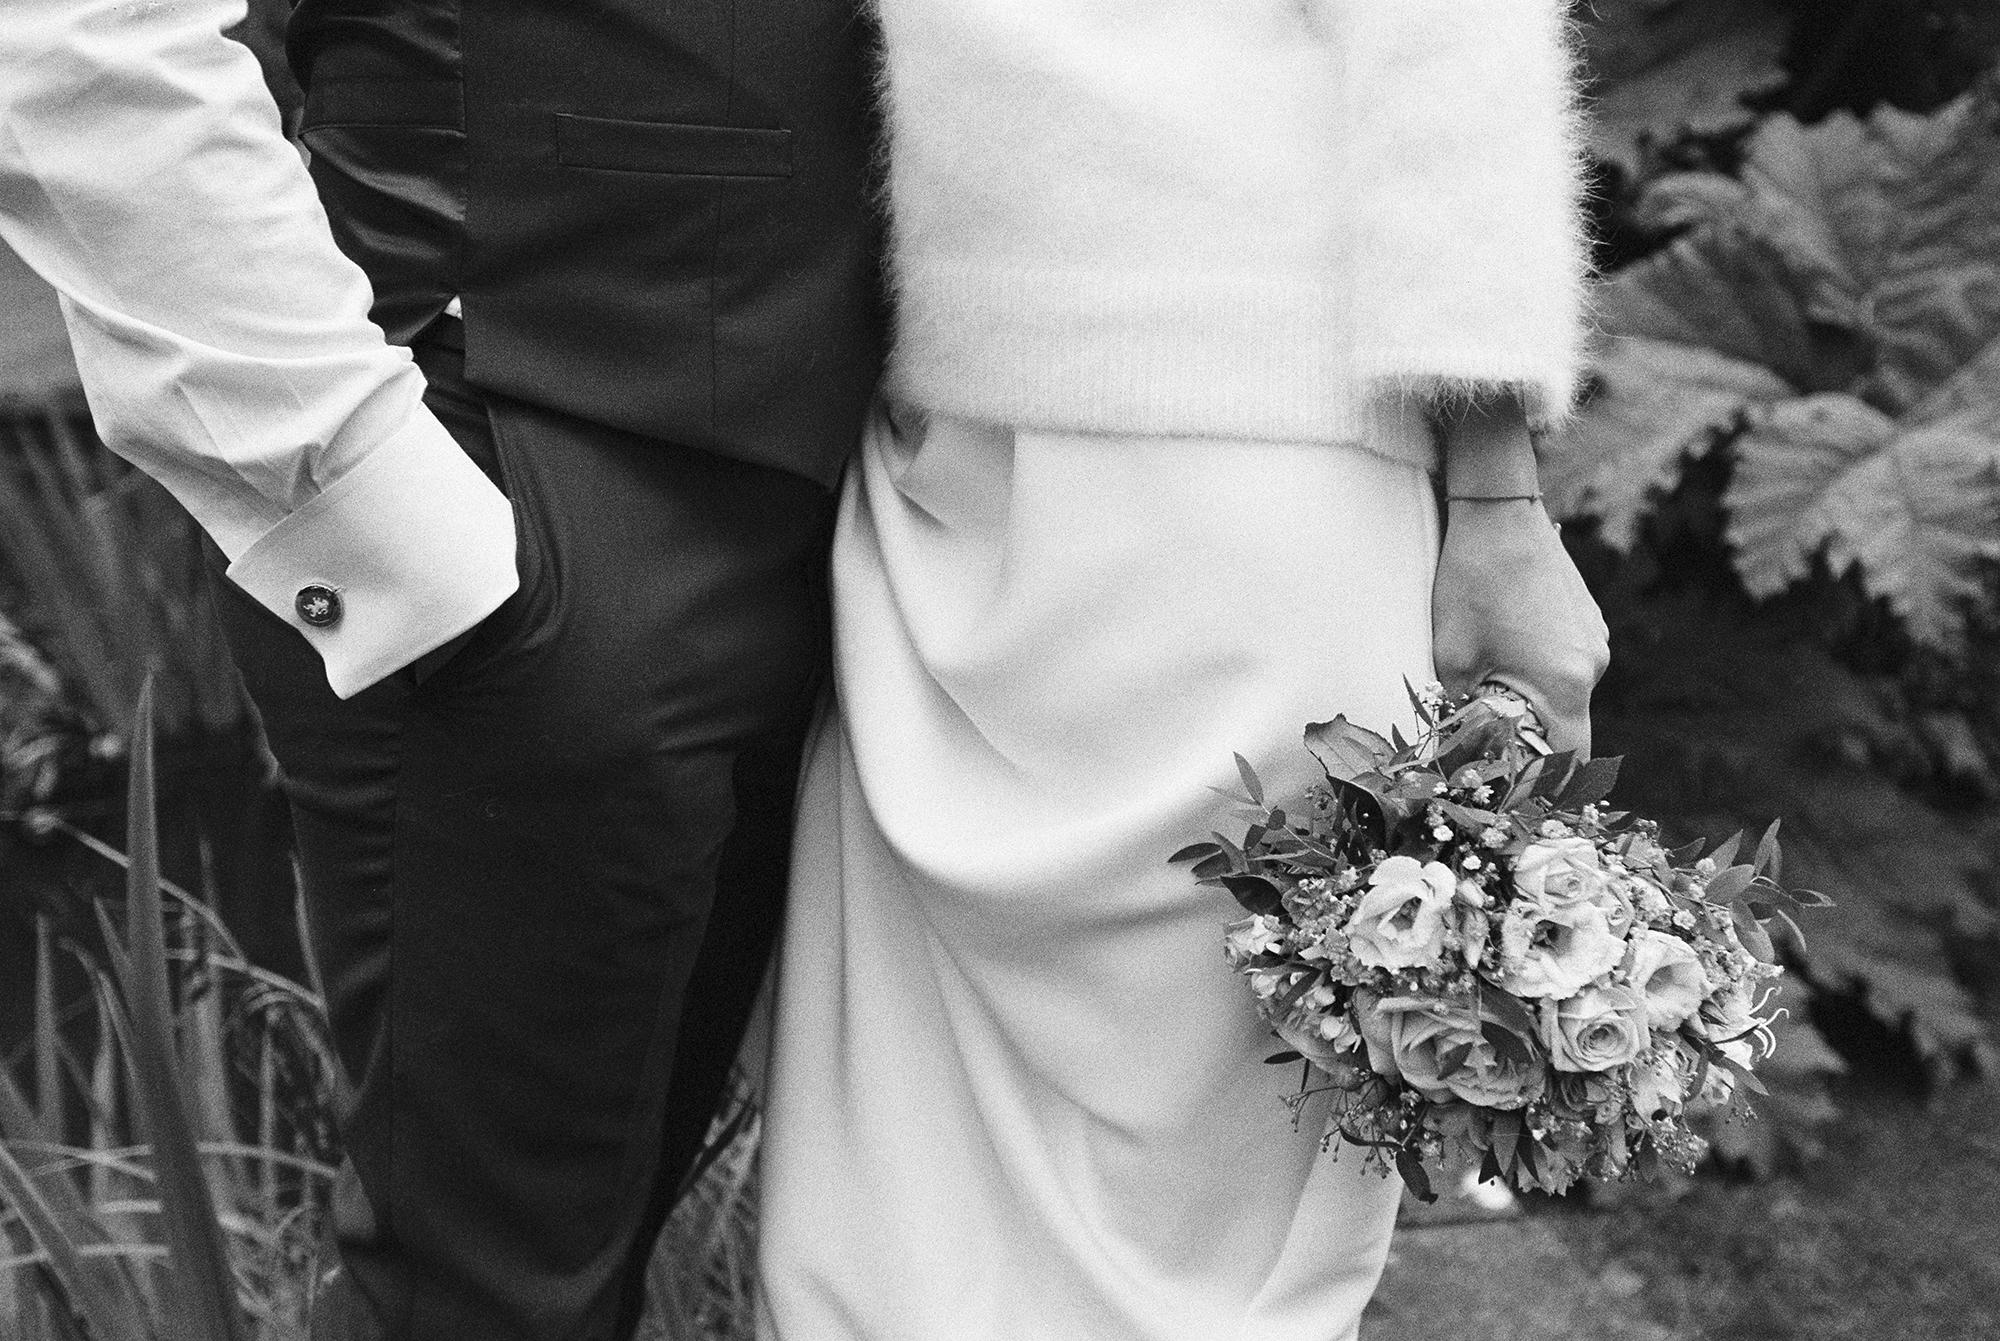 wedding_photographer_cumbria040.jpg